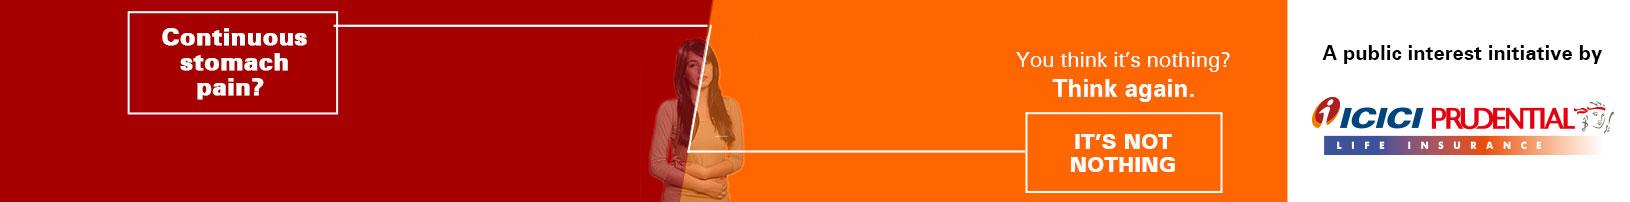 ICICI Prudential CSR Campaign GDN Creatives